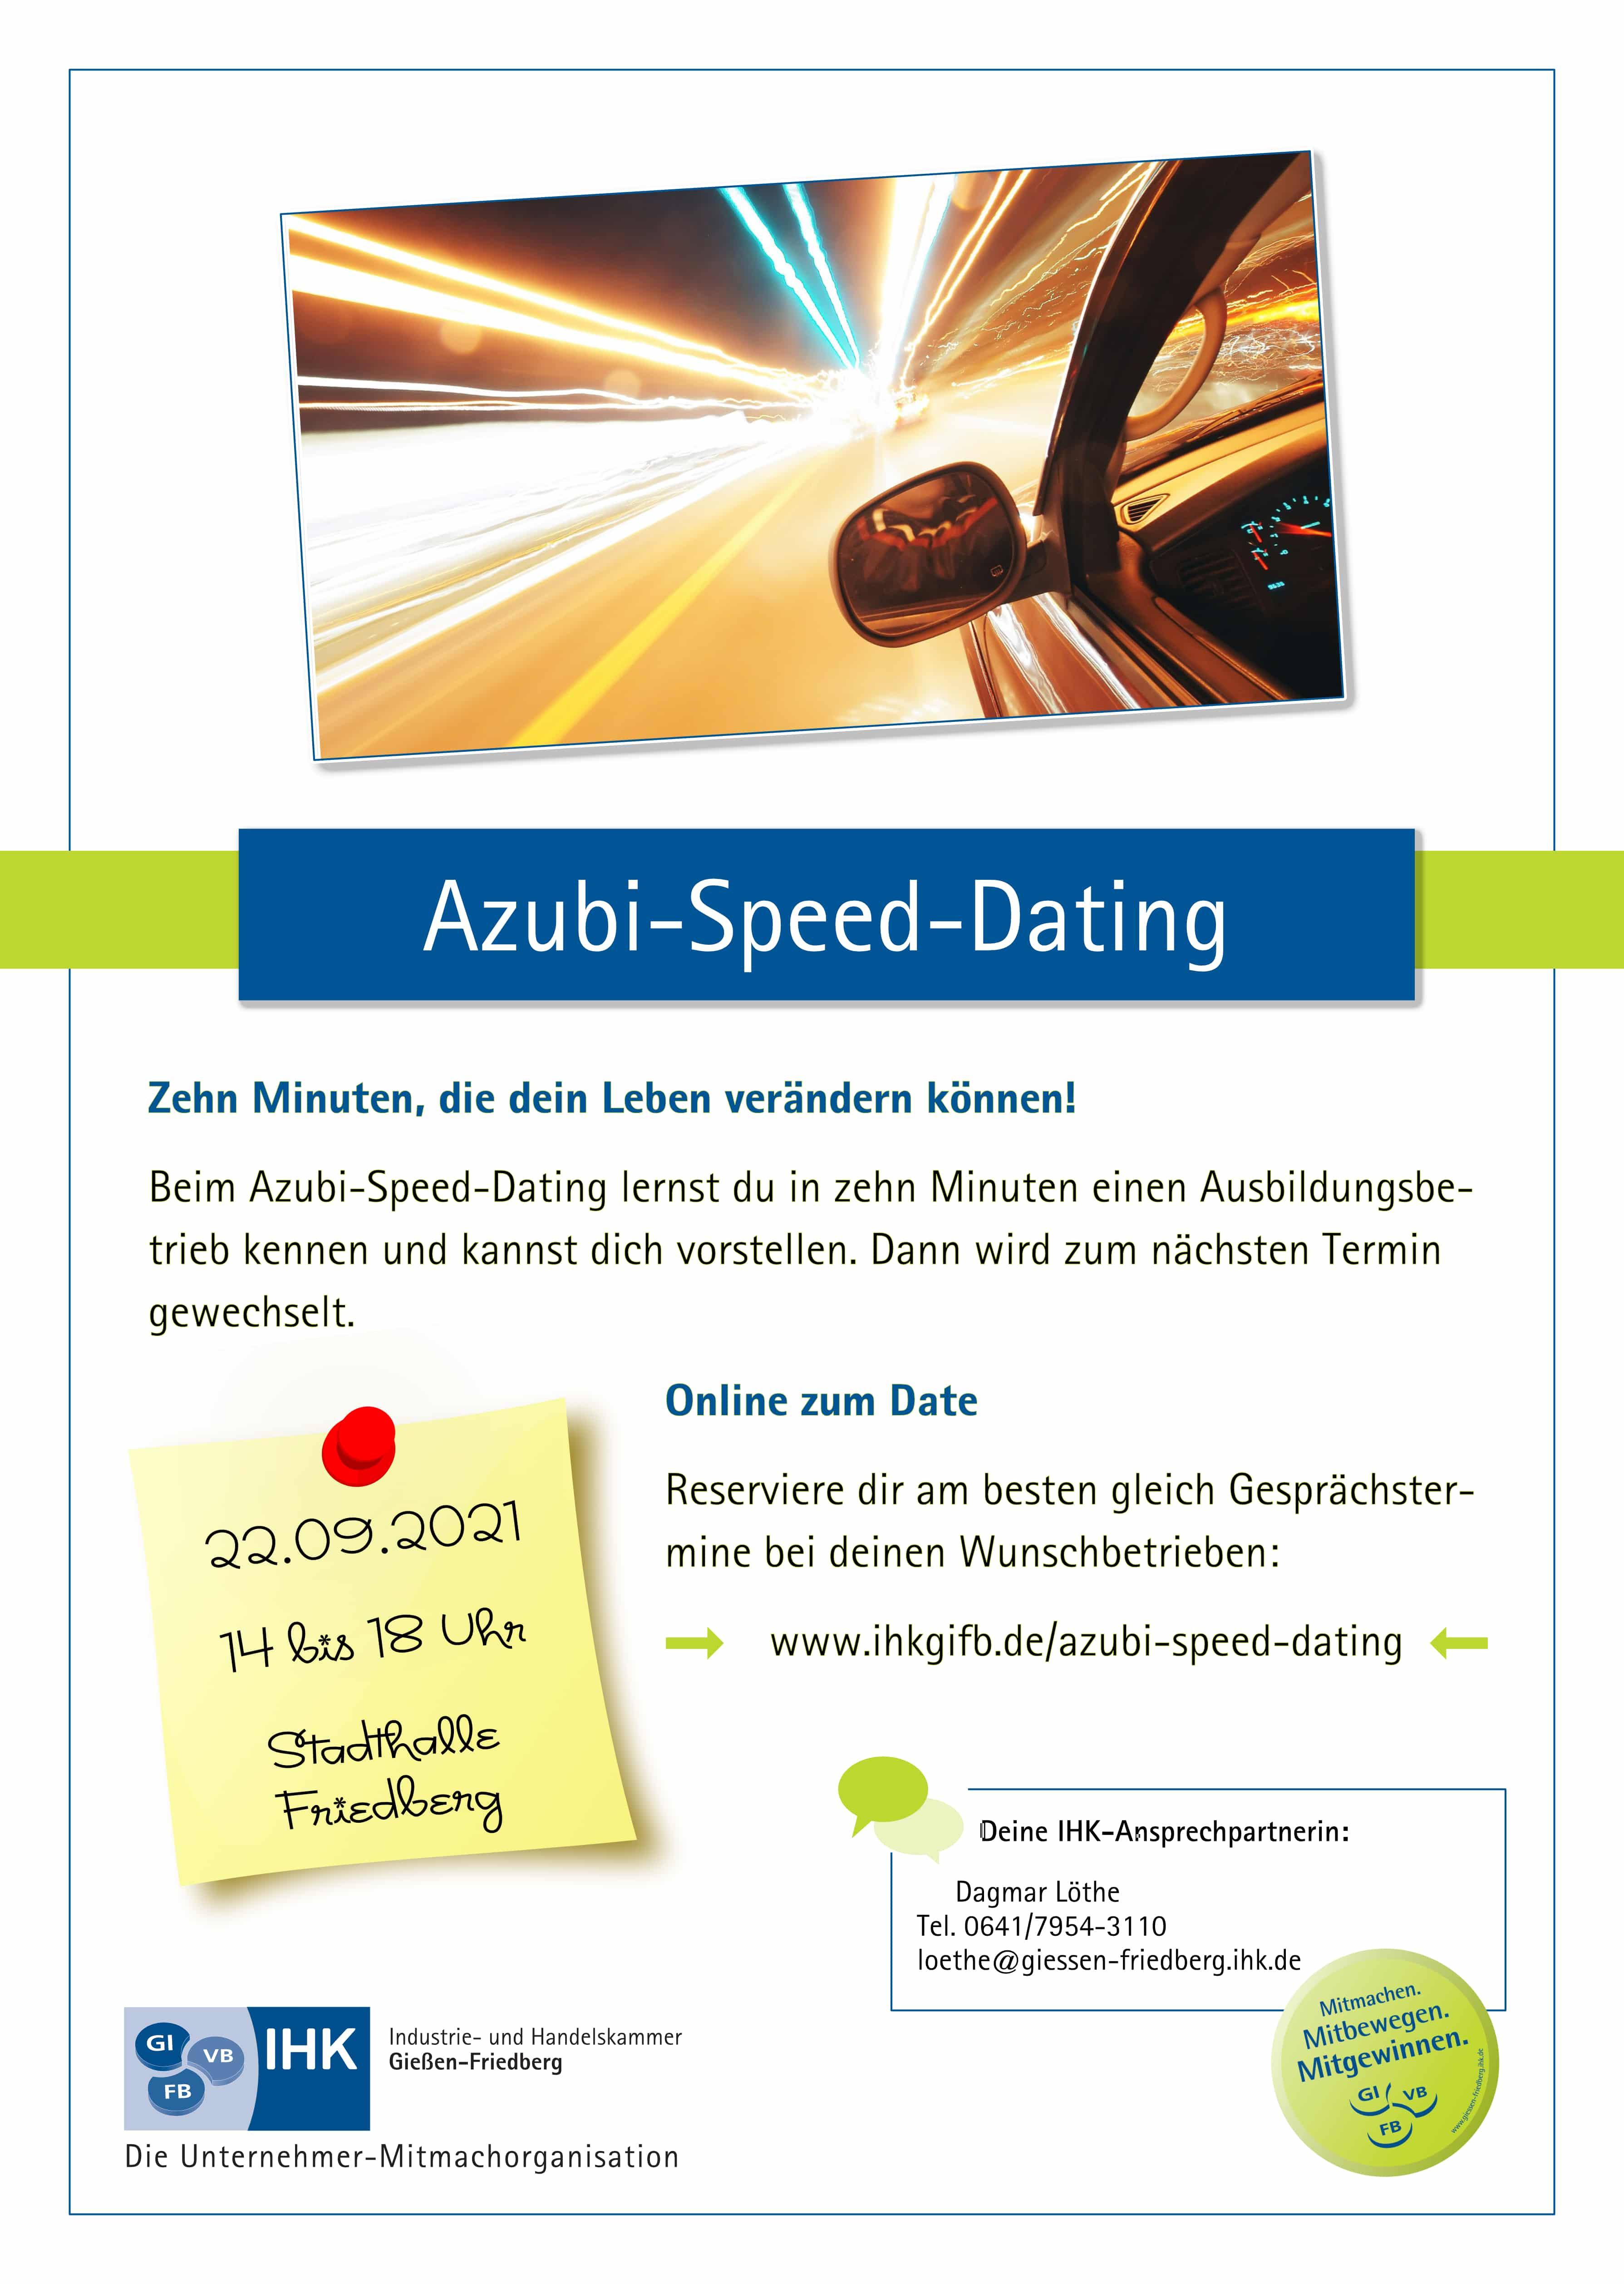 Azubi Speed Dating 22.09.2021